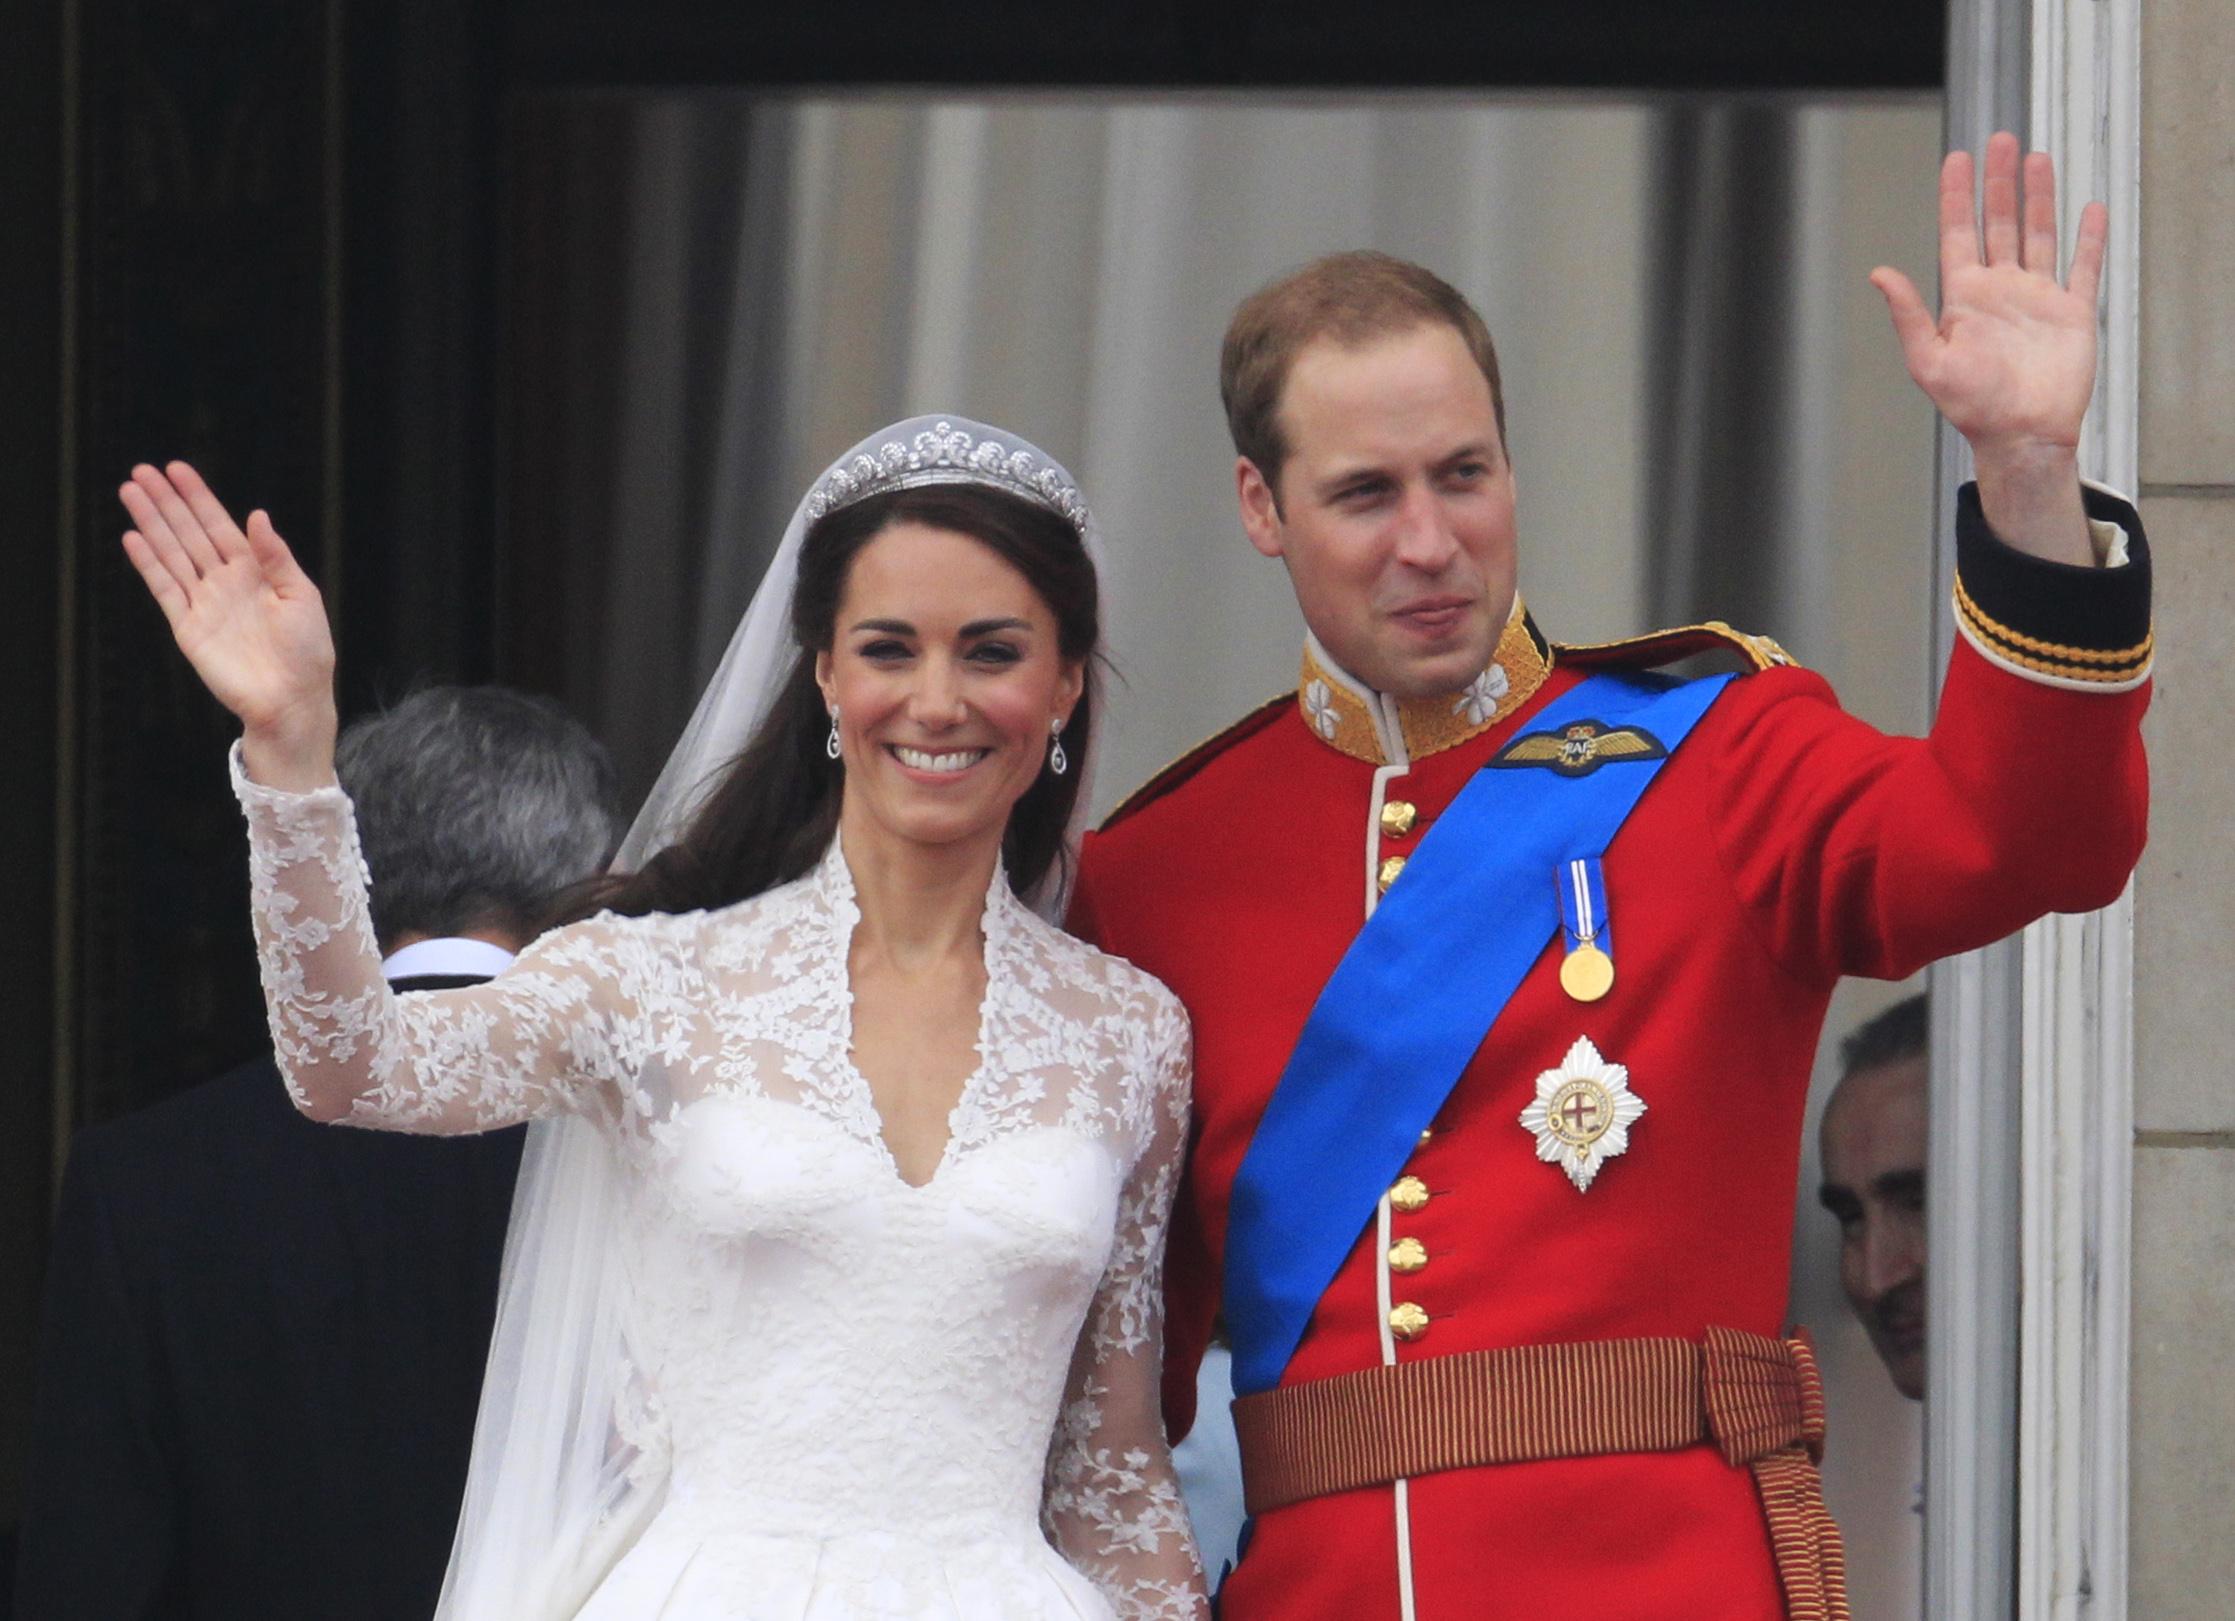 Prince William, Kate Middleton Royal Wedding Photos